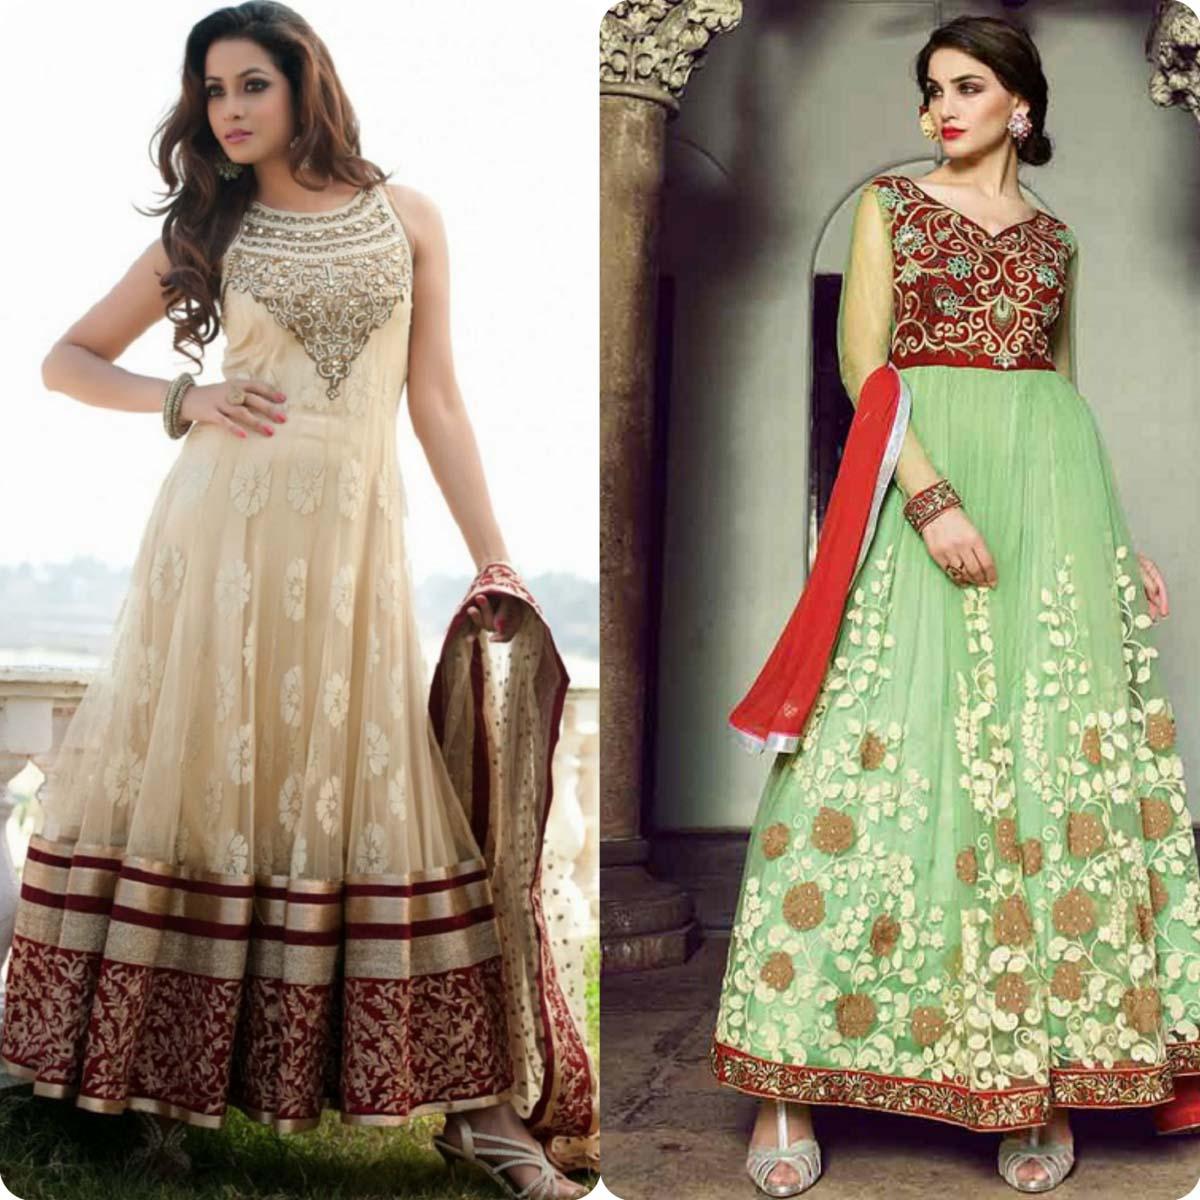 Indian Stylish Umbrella Frock and Churidar Dresses for Girls 2016-2017 (9)